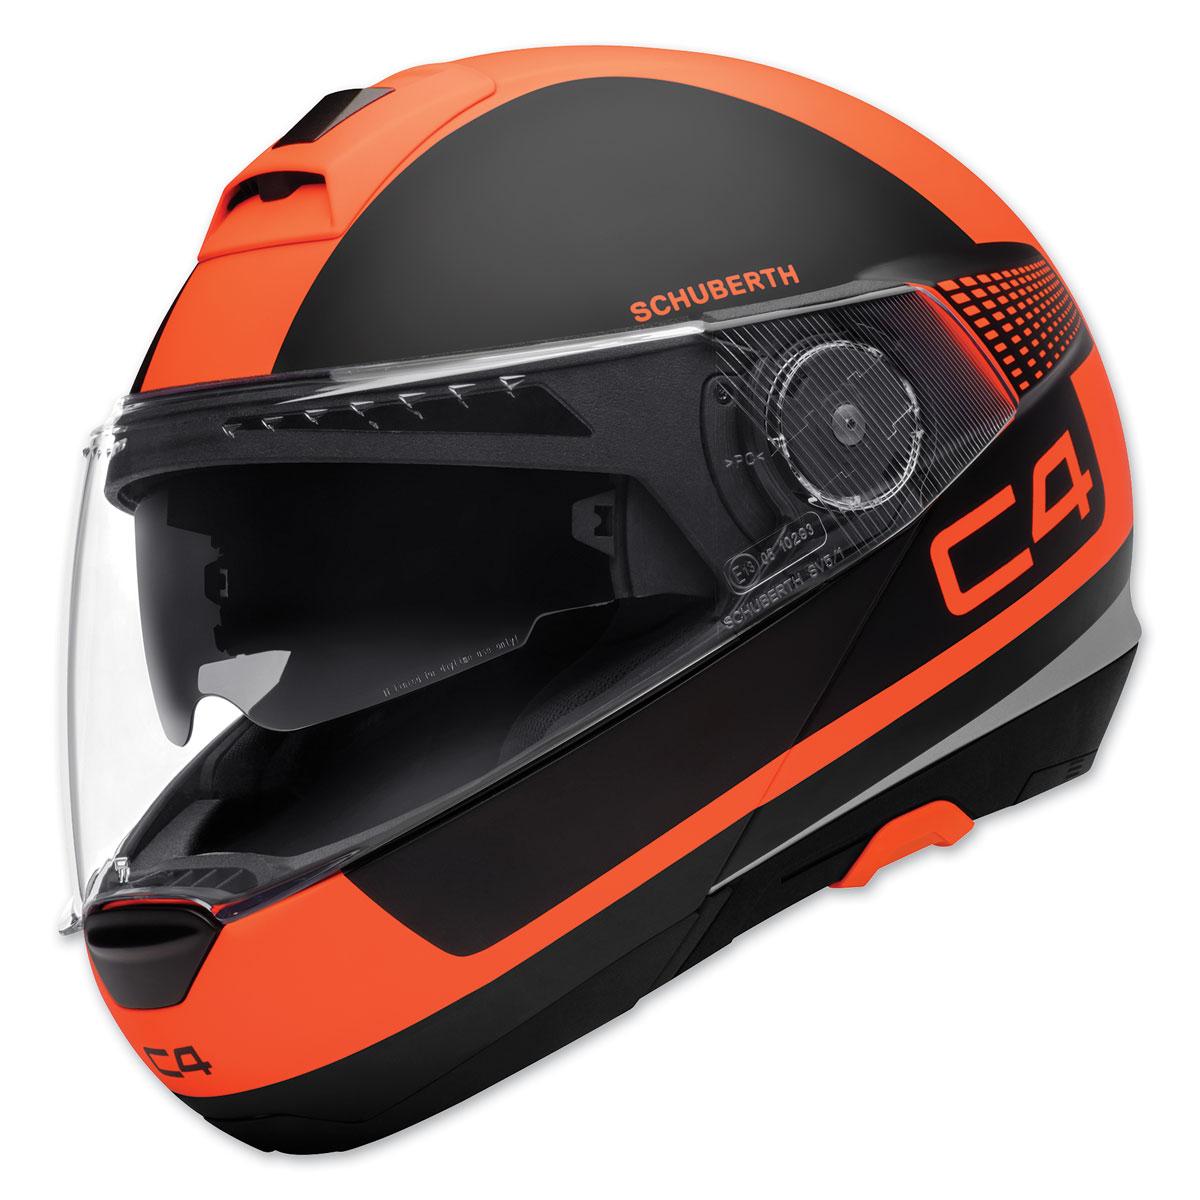 Schuberth C4 Legacy Orange Modular Helmet